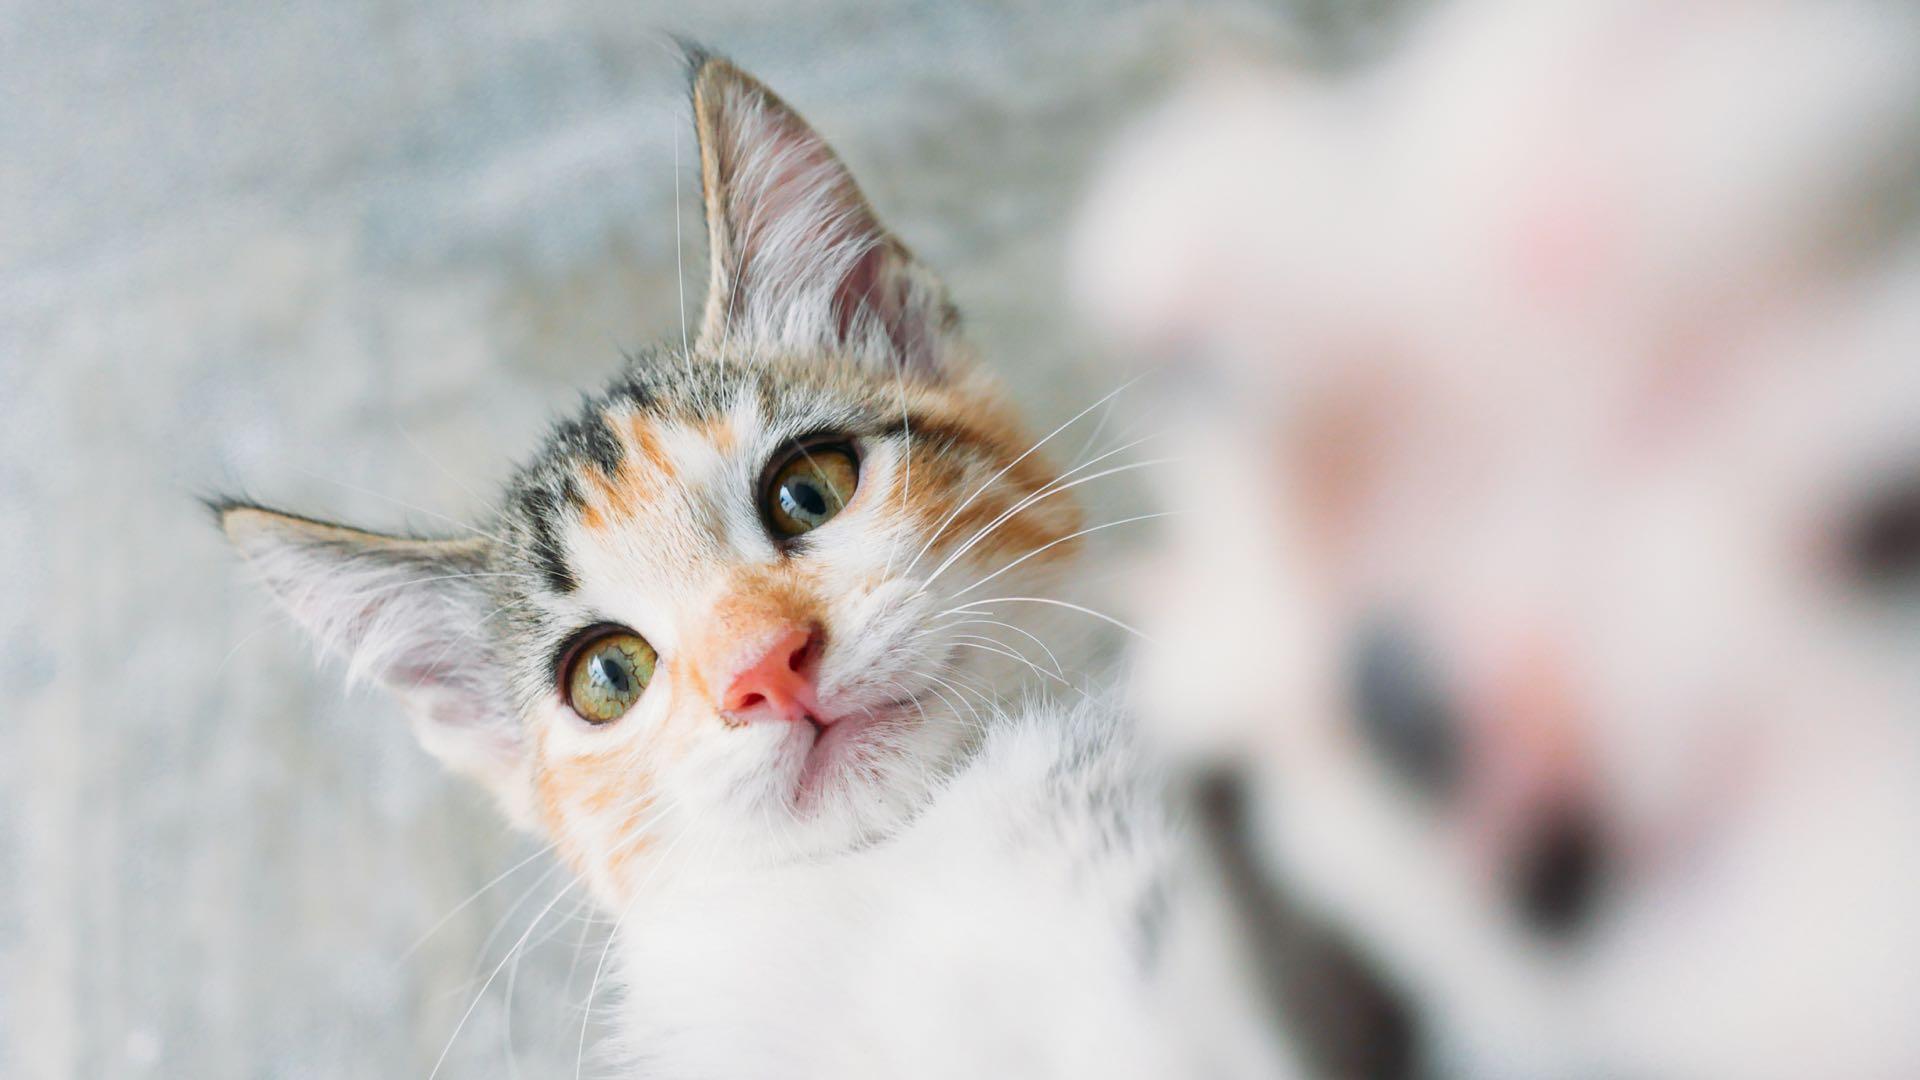 Cats Wallpapers Desktop - Lovely and Playful kitten